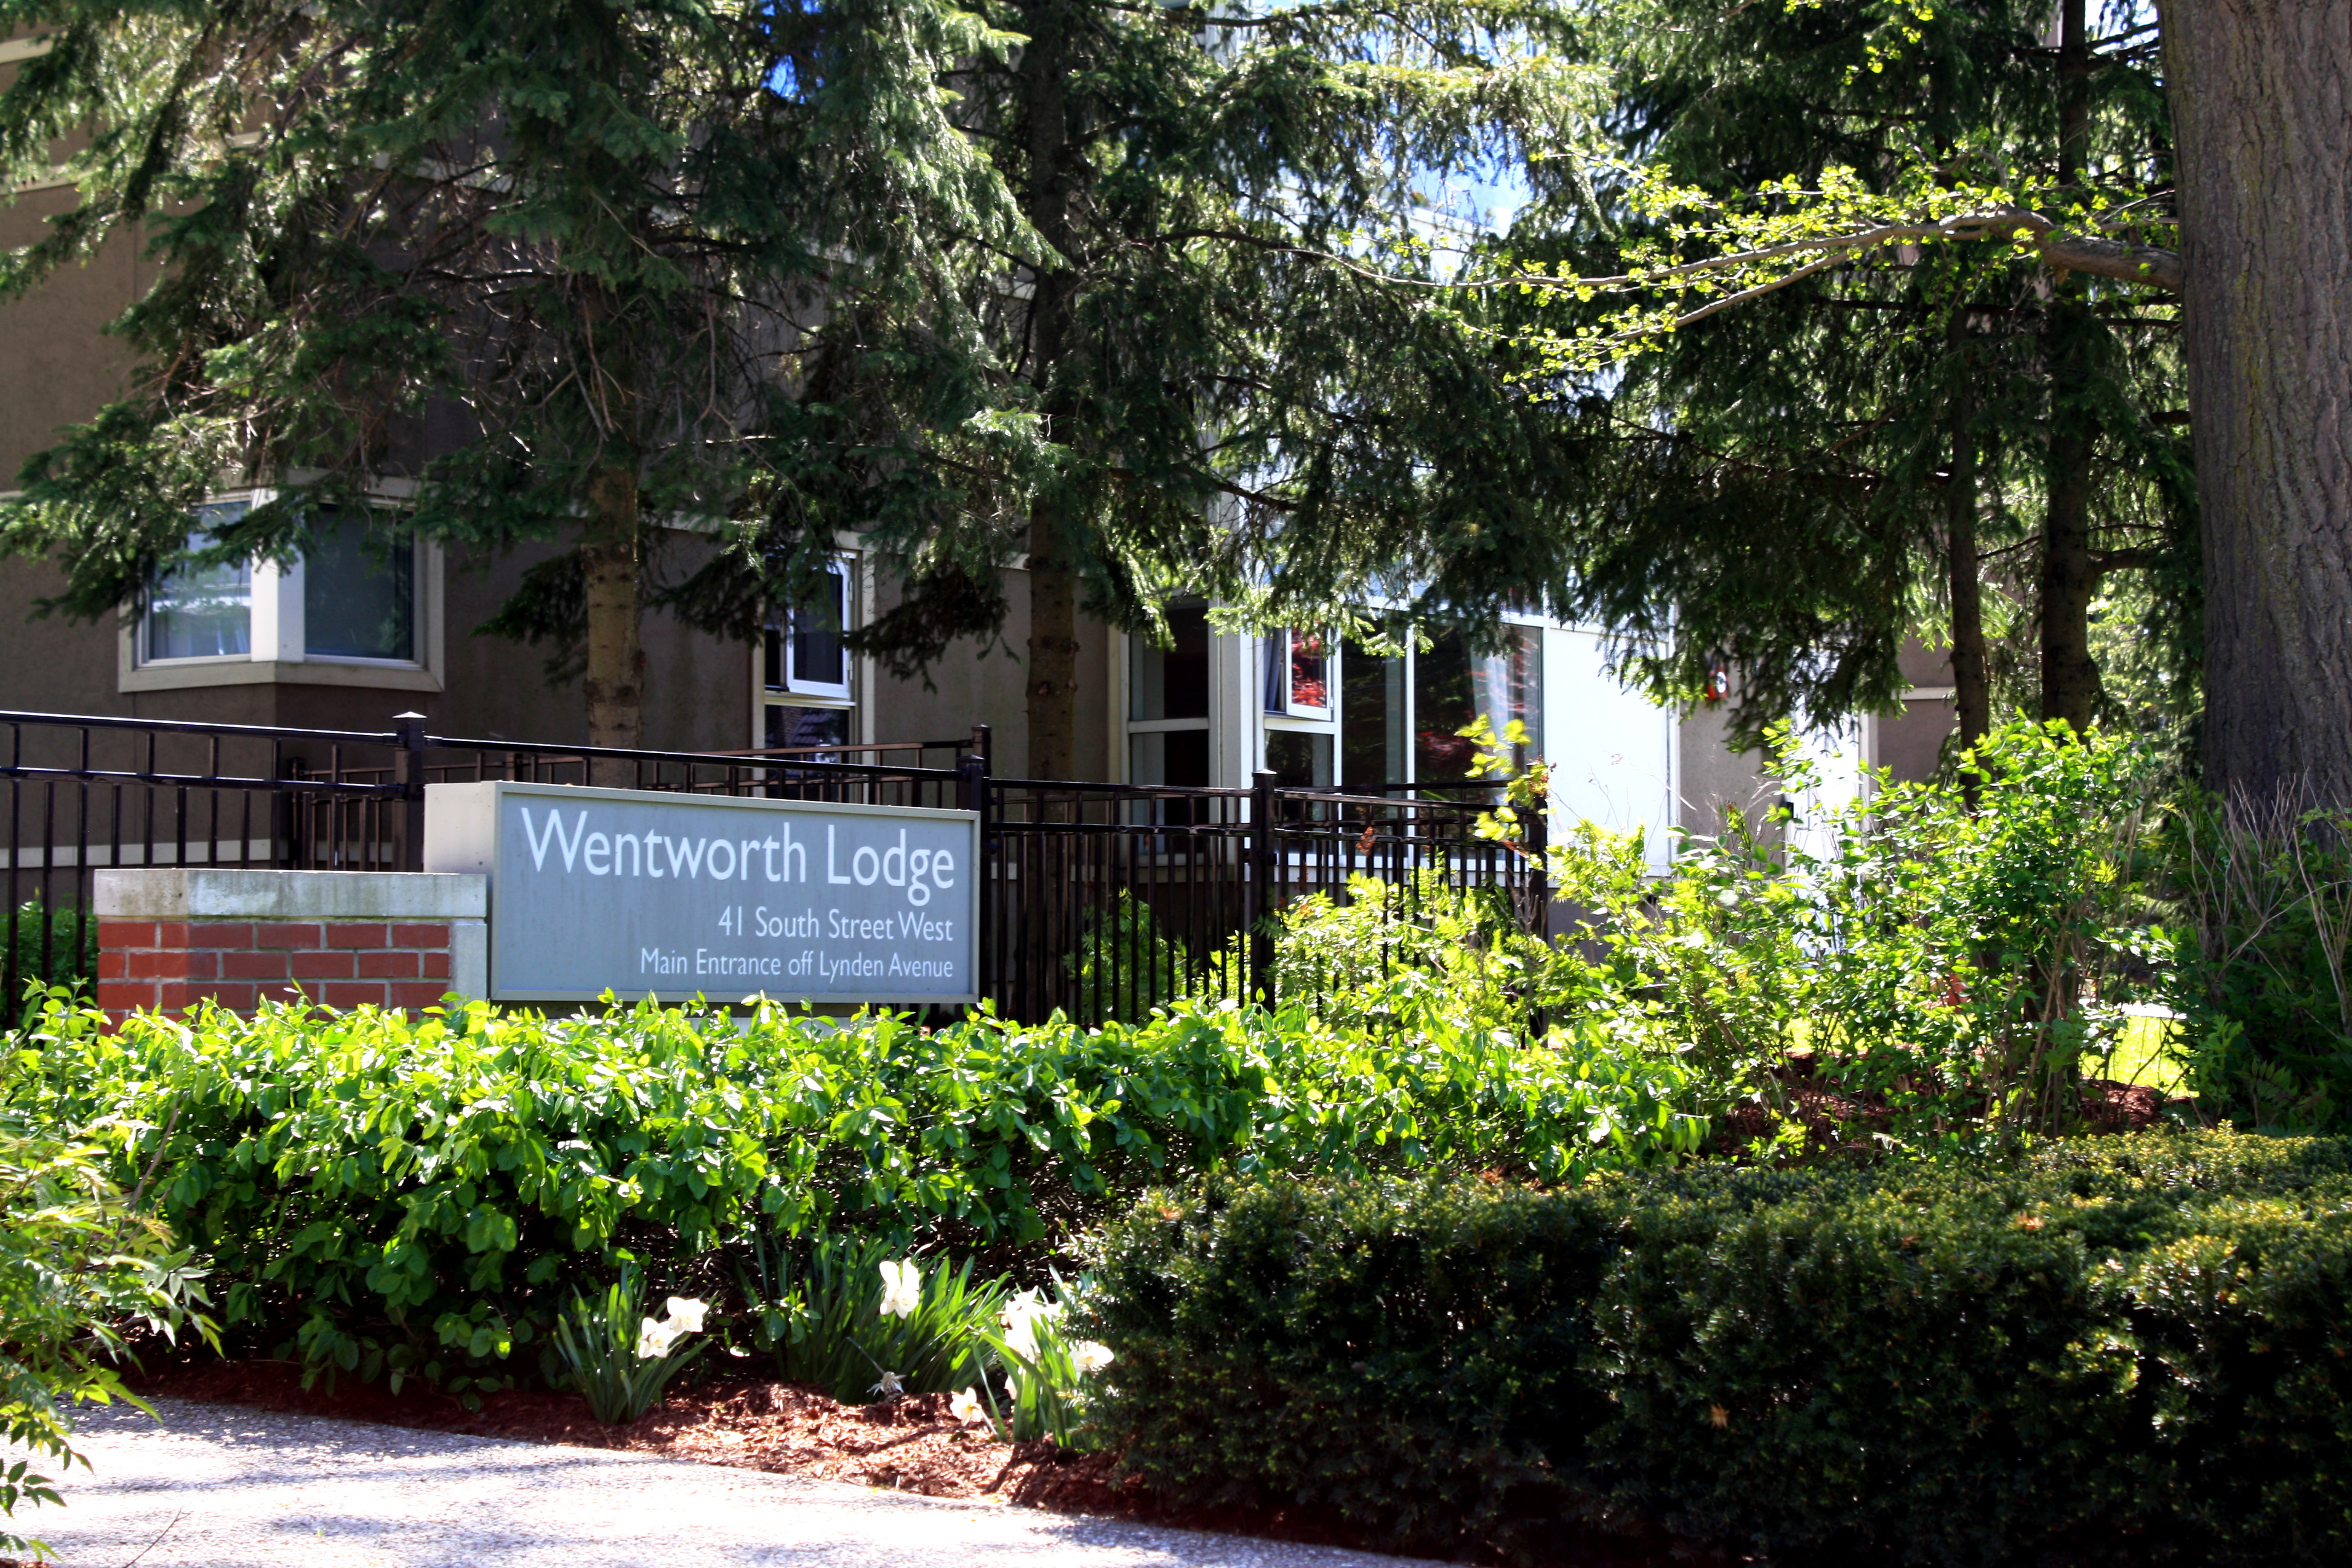 Wentworth Lodge